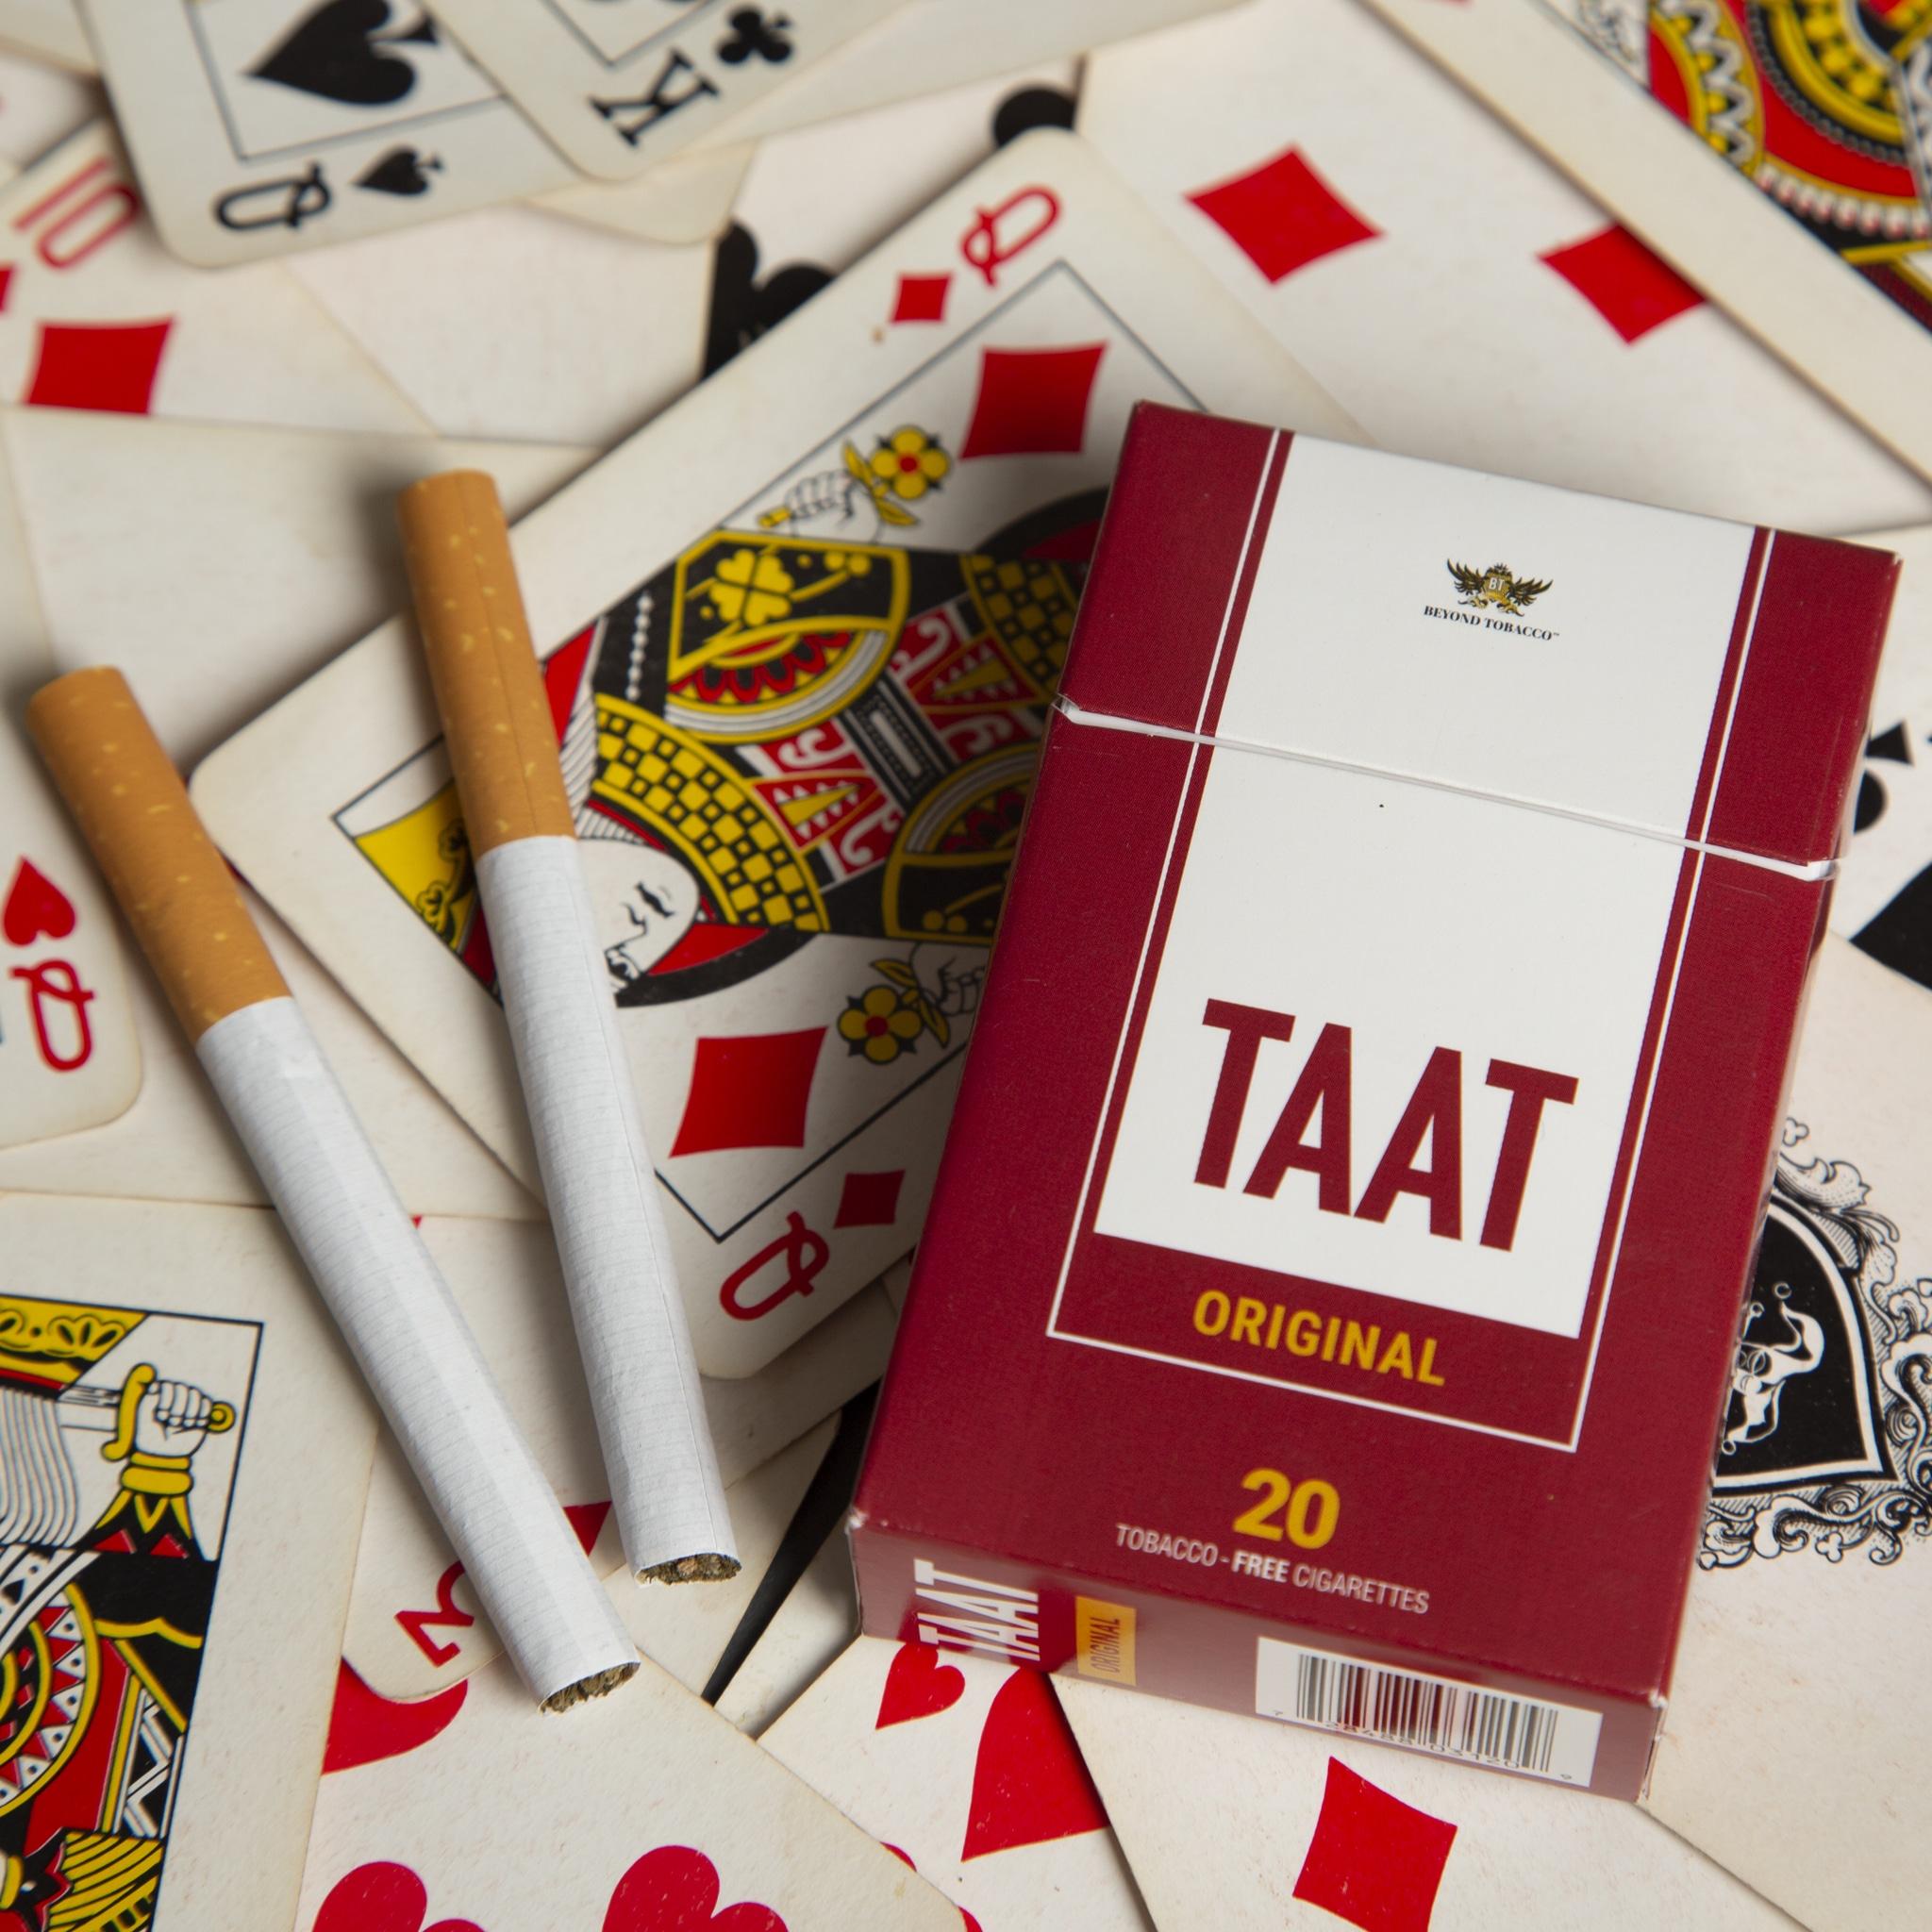 Free TAAT Tobacco & Nicotine-Free Cigarettes